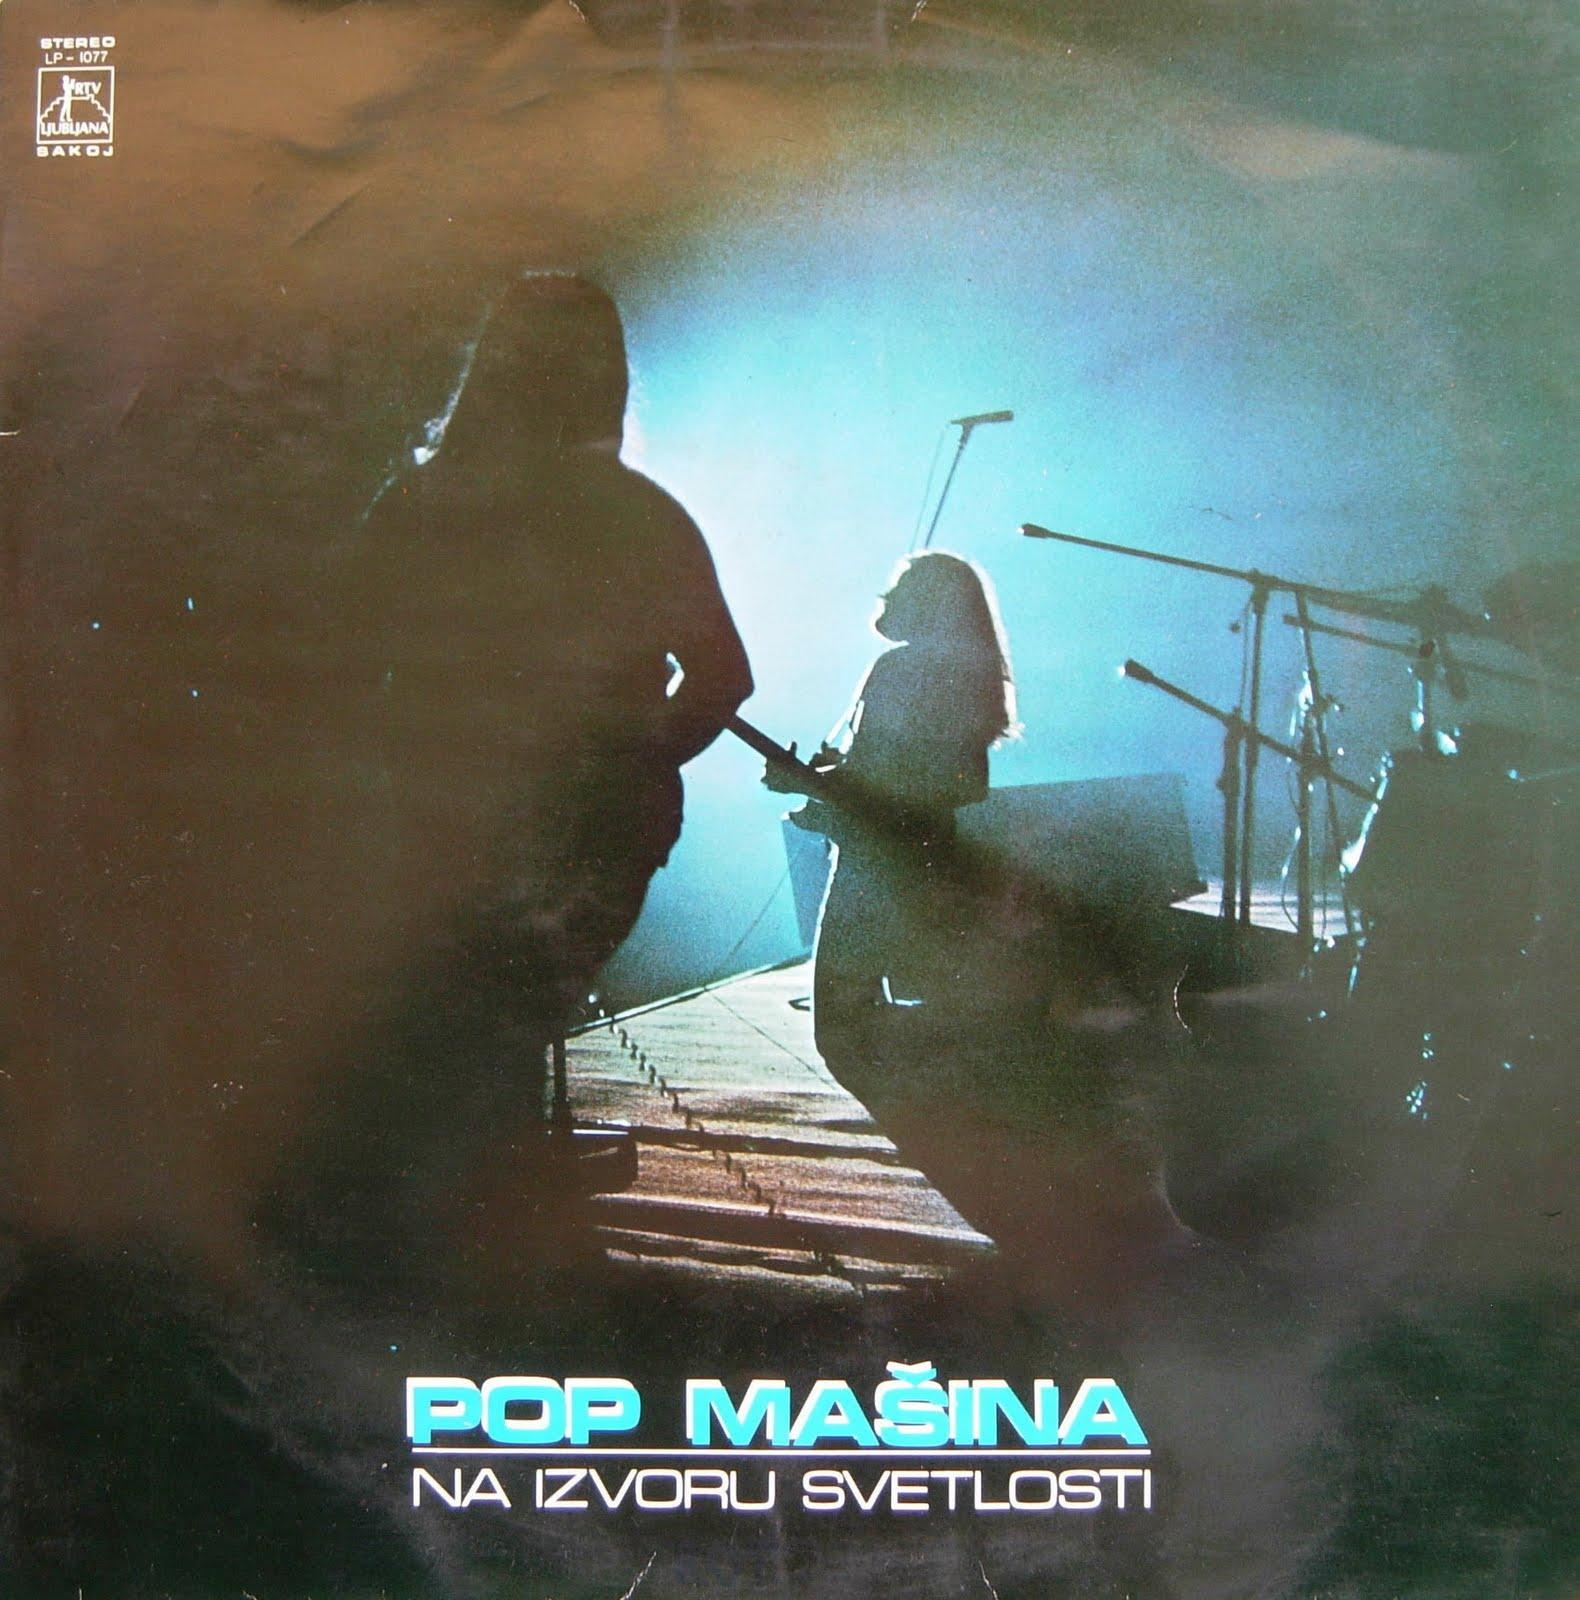 Pop Mašina - Kiselina